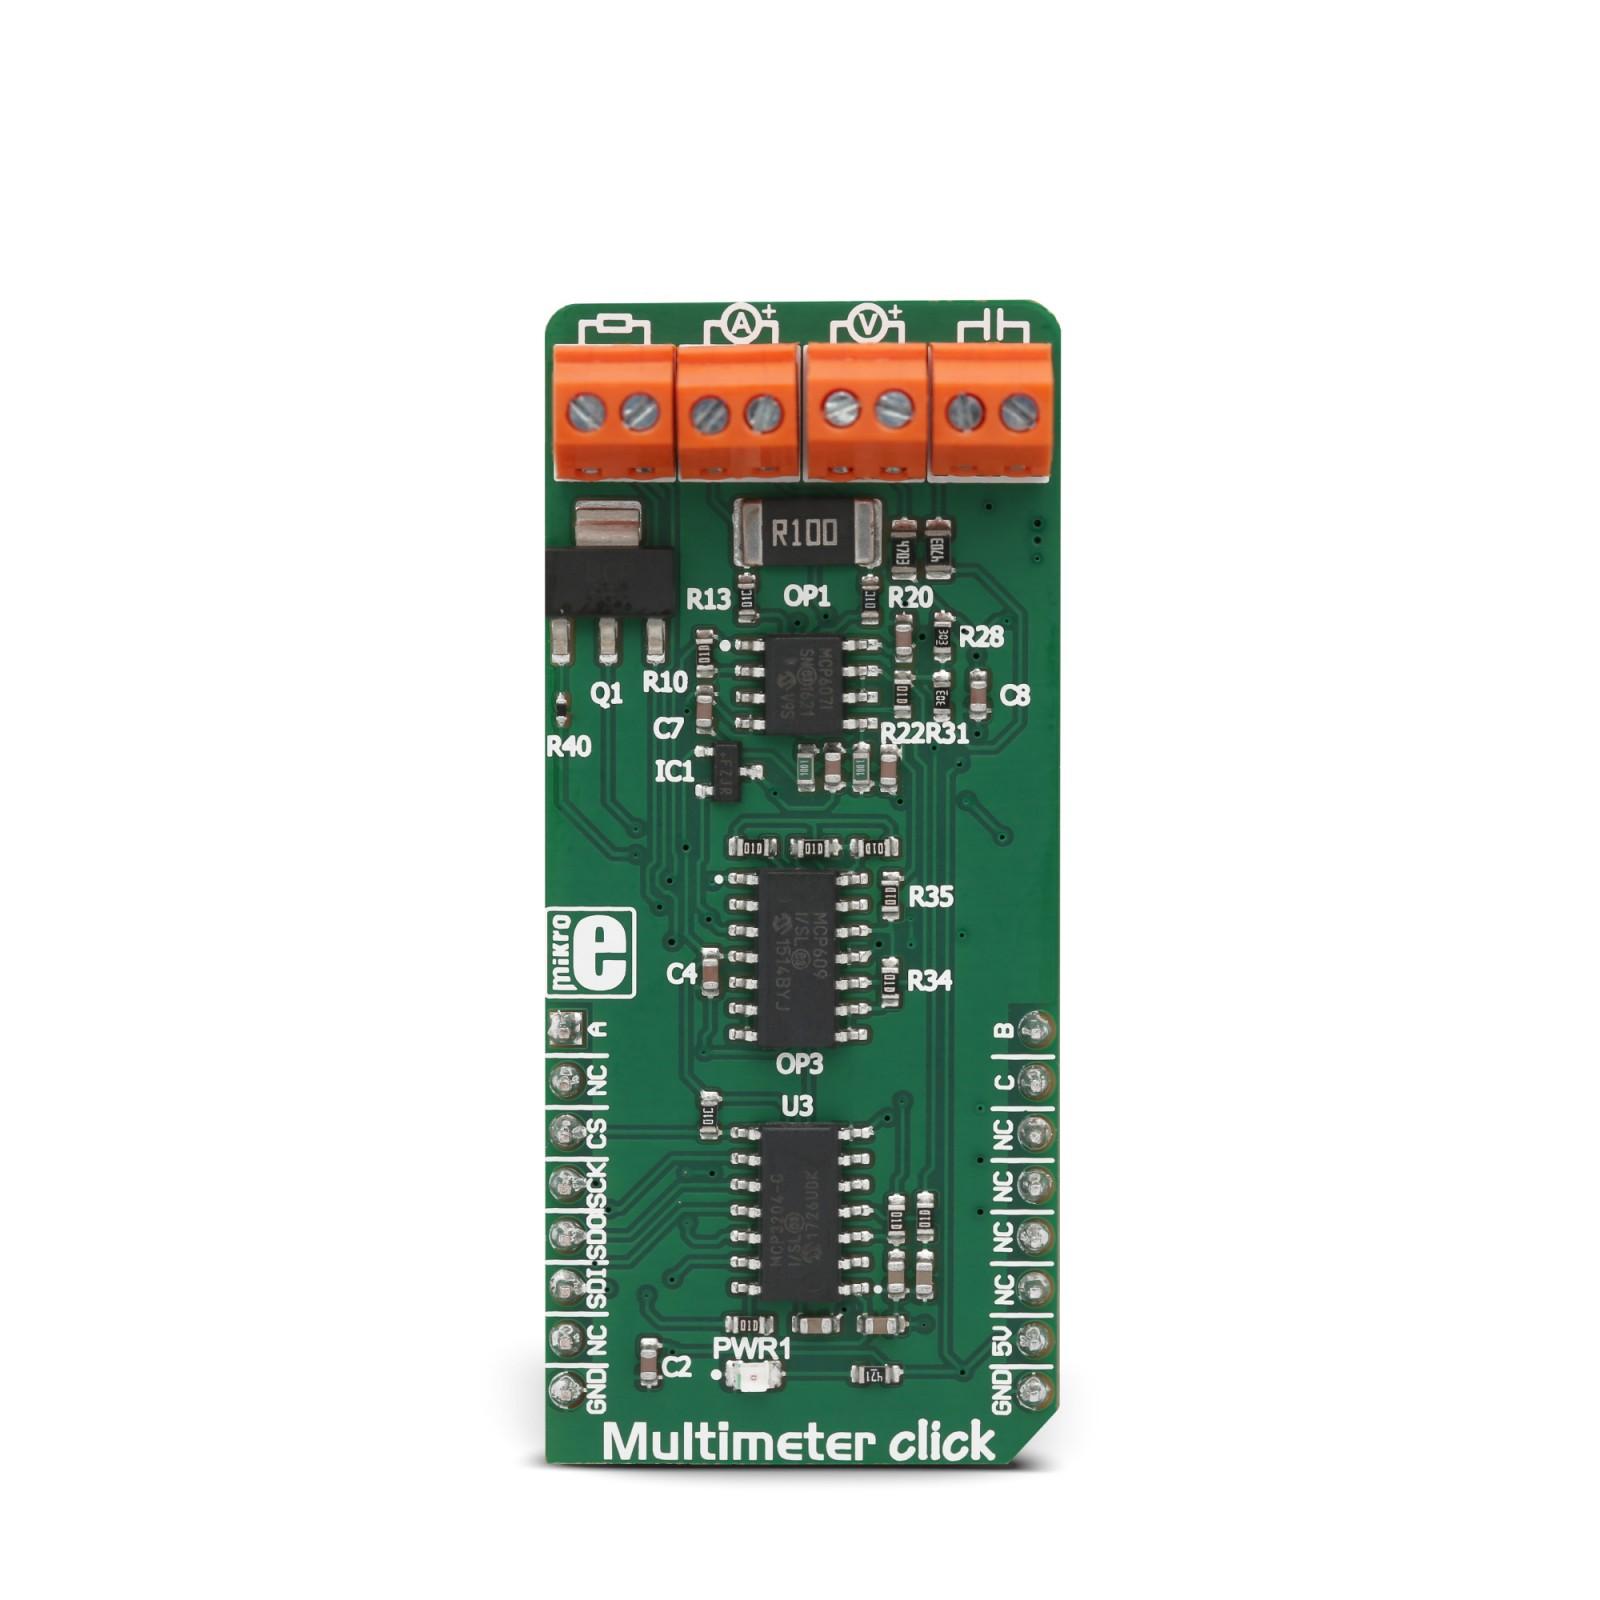 Multimeter Click Mikroelektronika Series Parallel Circuit Examples How To Use A Mgctlbxnmzp Mgctlbxv5112 Mgctlbxlc Mgctlbxpprestashop